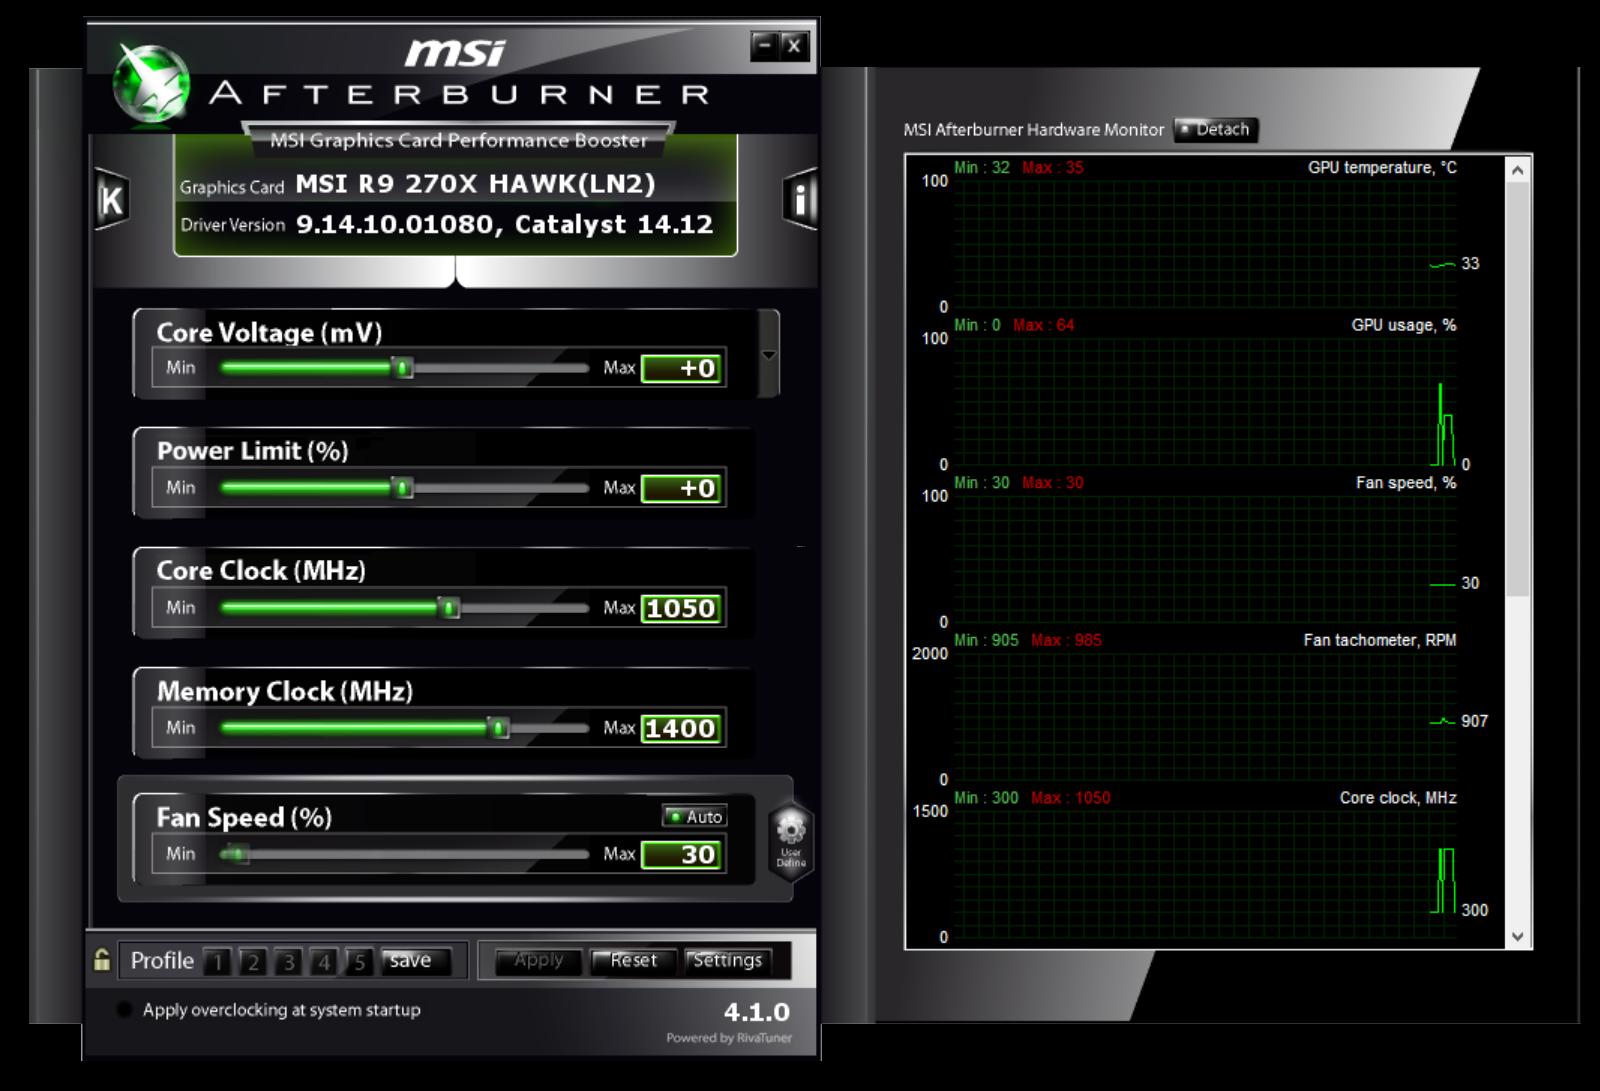 msi-afterburner-interface-large.png